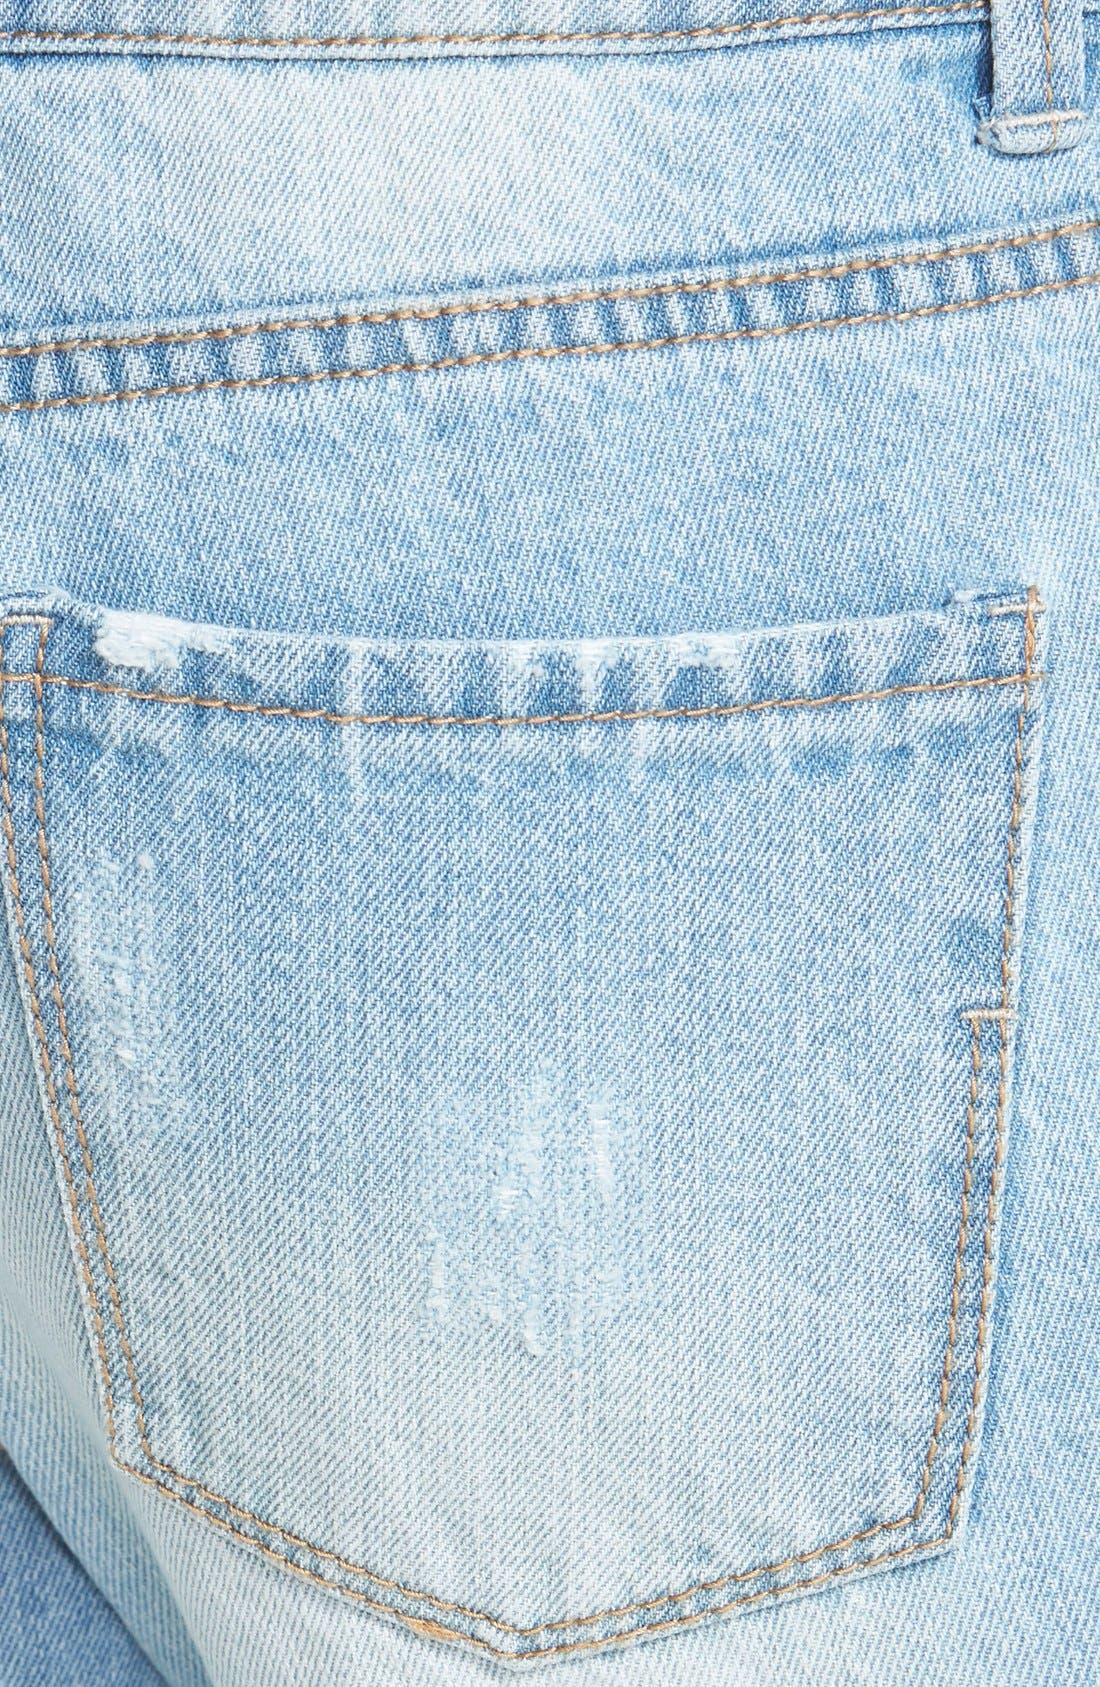 Alternate Image 3  - Generra Boyfriend Jeans (Blue)